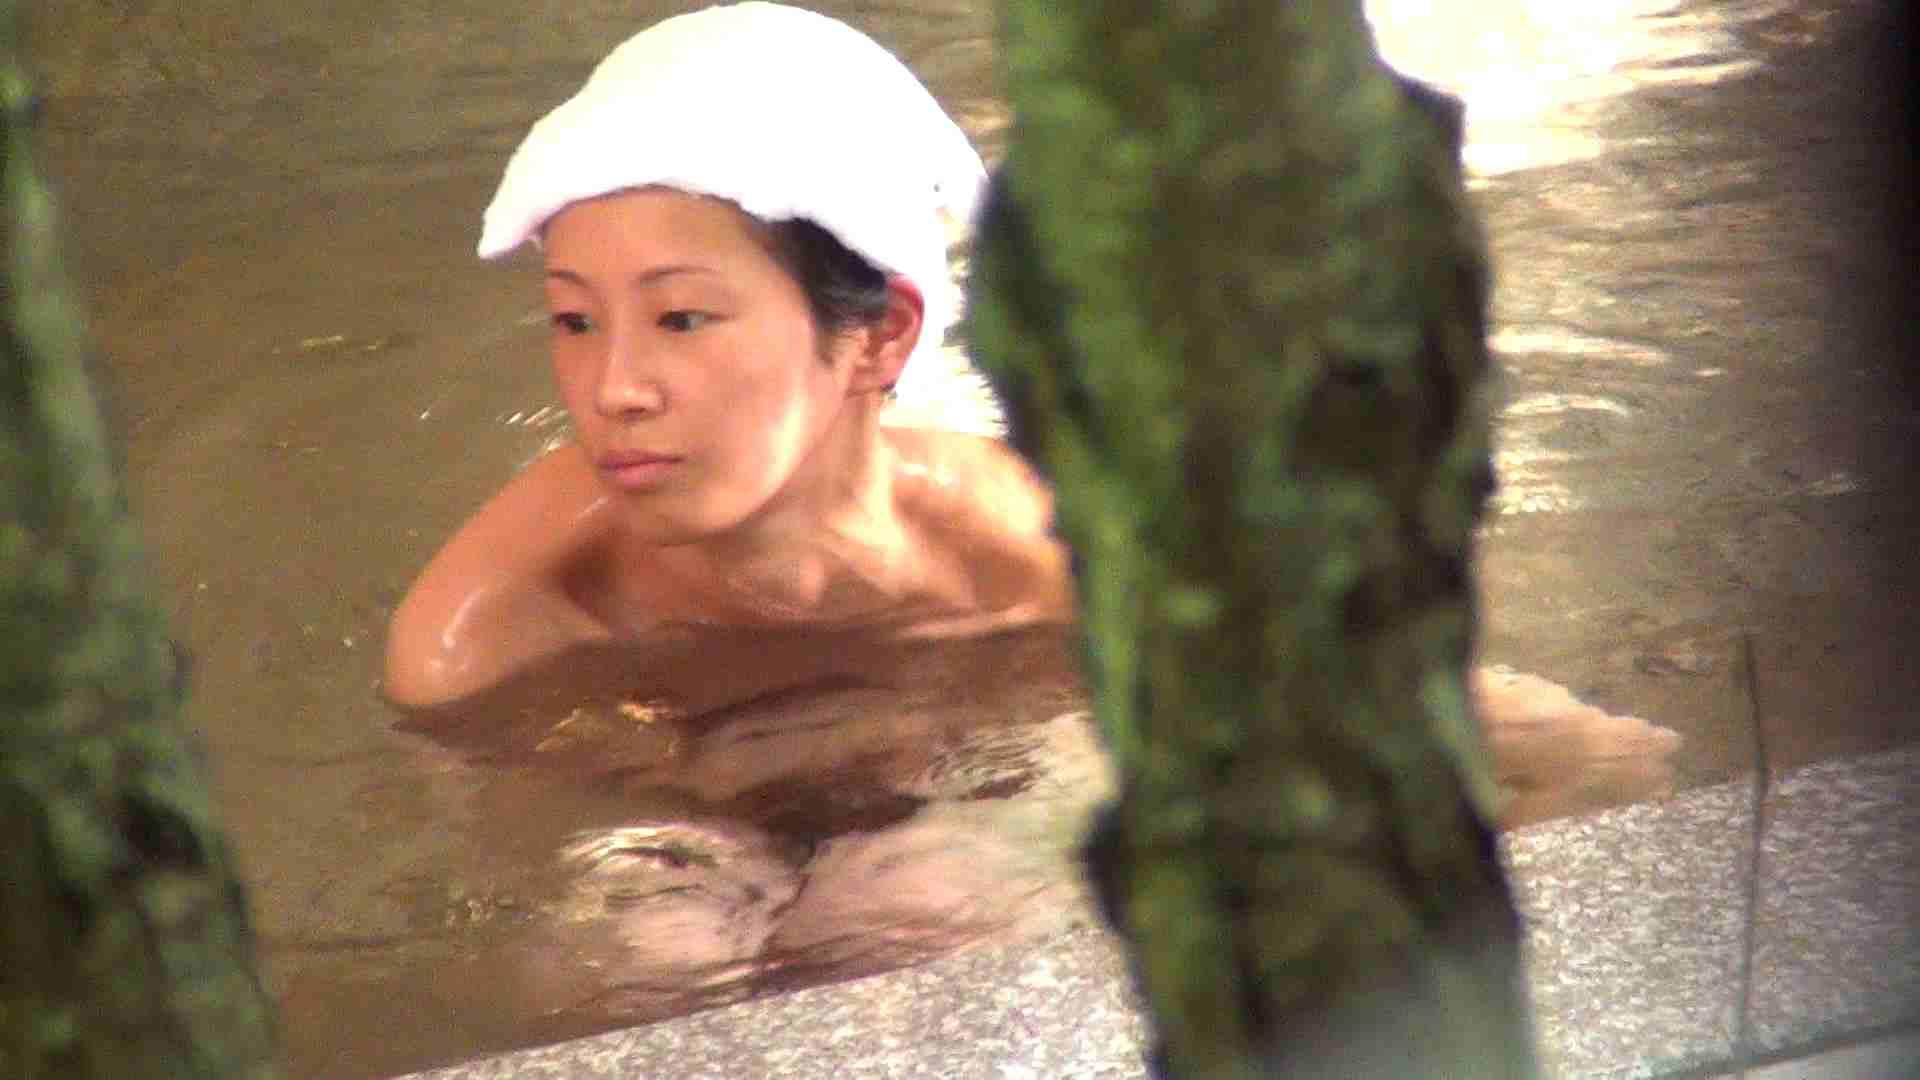 Vol.51 醤油j顔のお女市さん 胸の割りに下半身はがっちりタイプ 露天丸見え  79画像 70